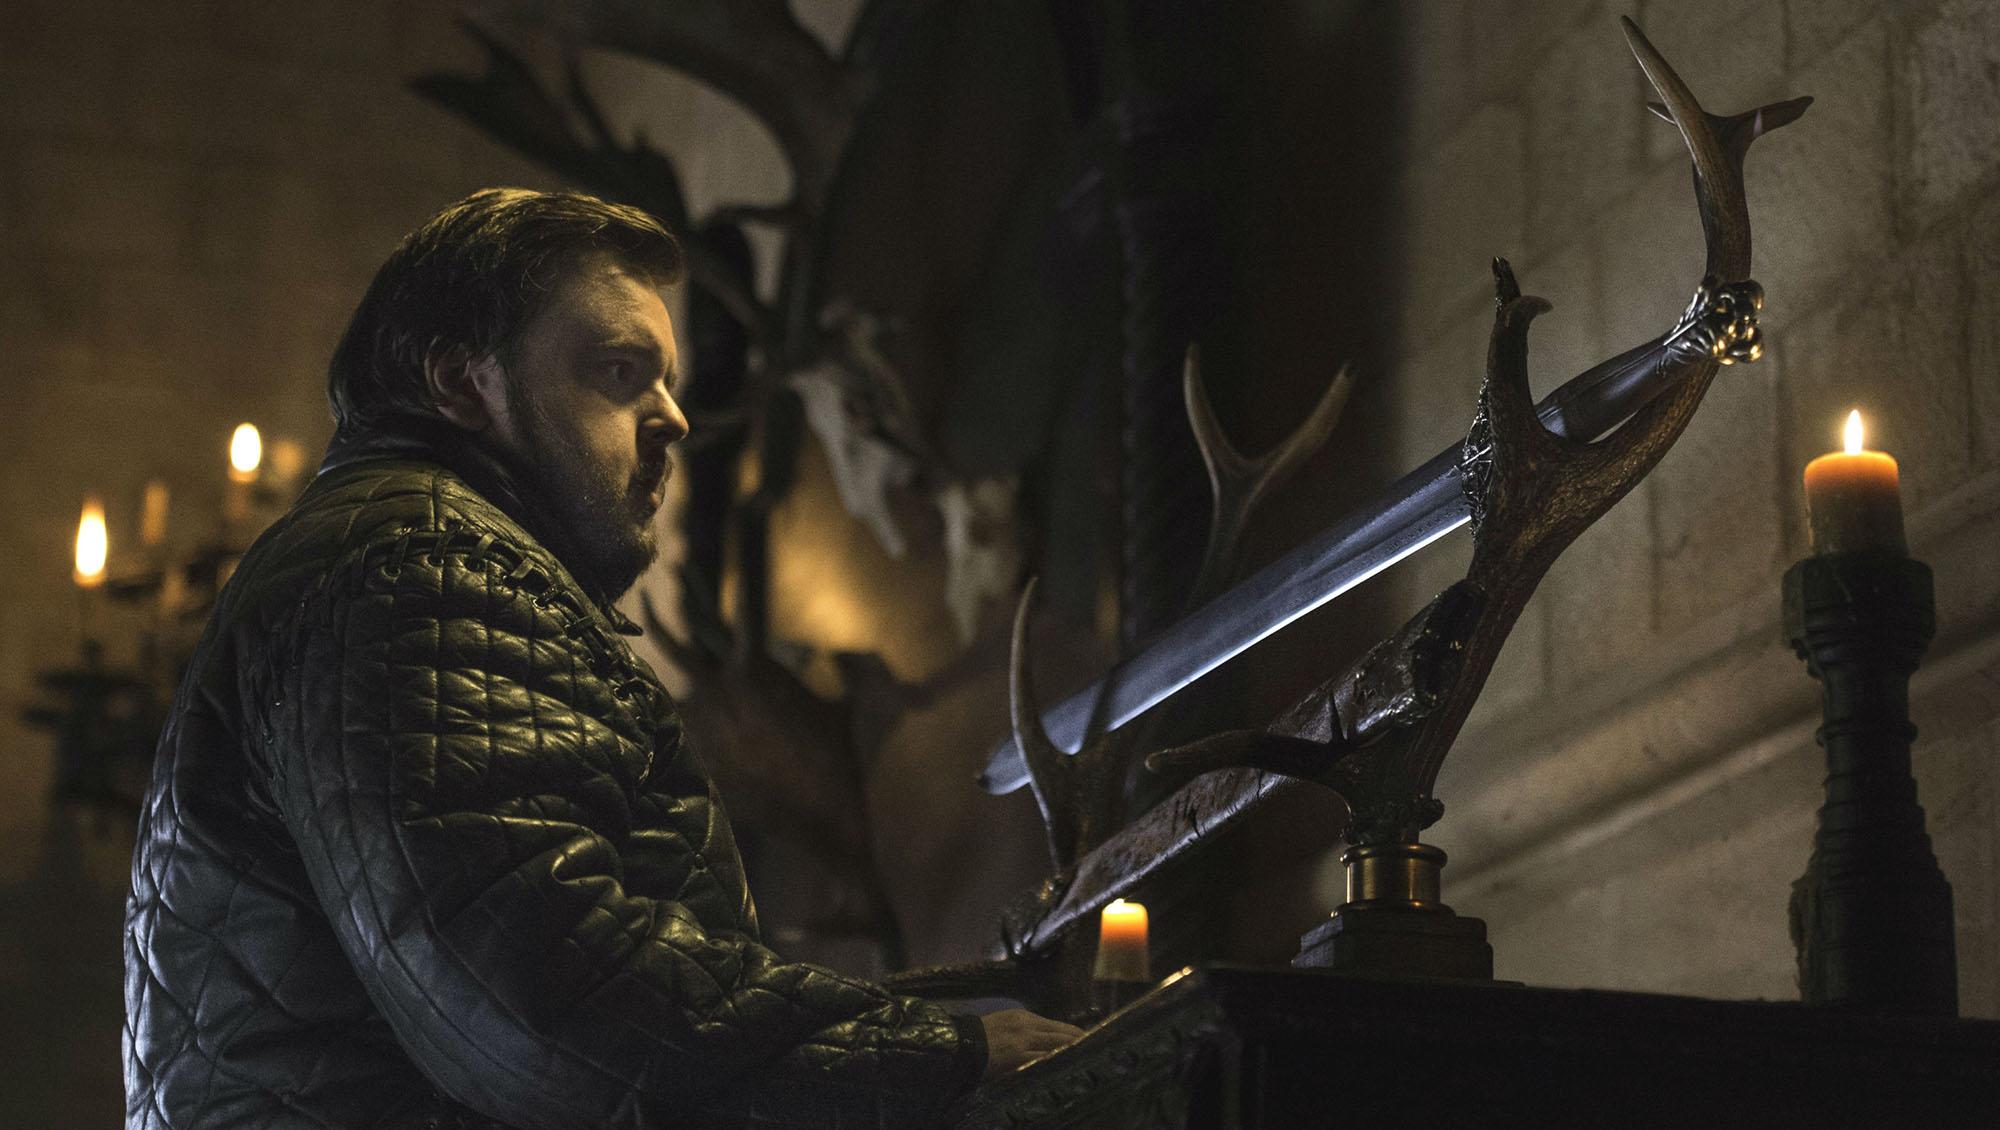 Samwell Tarly et l'épée en acier valyrien de sa famille